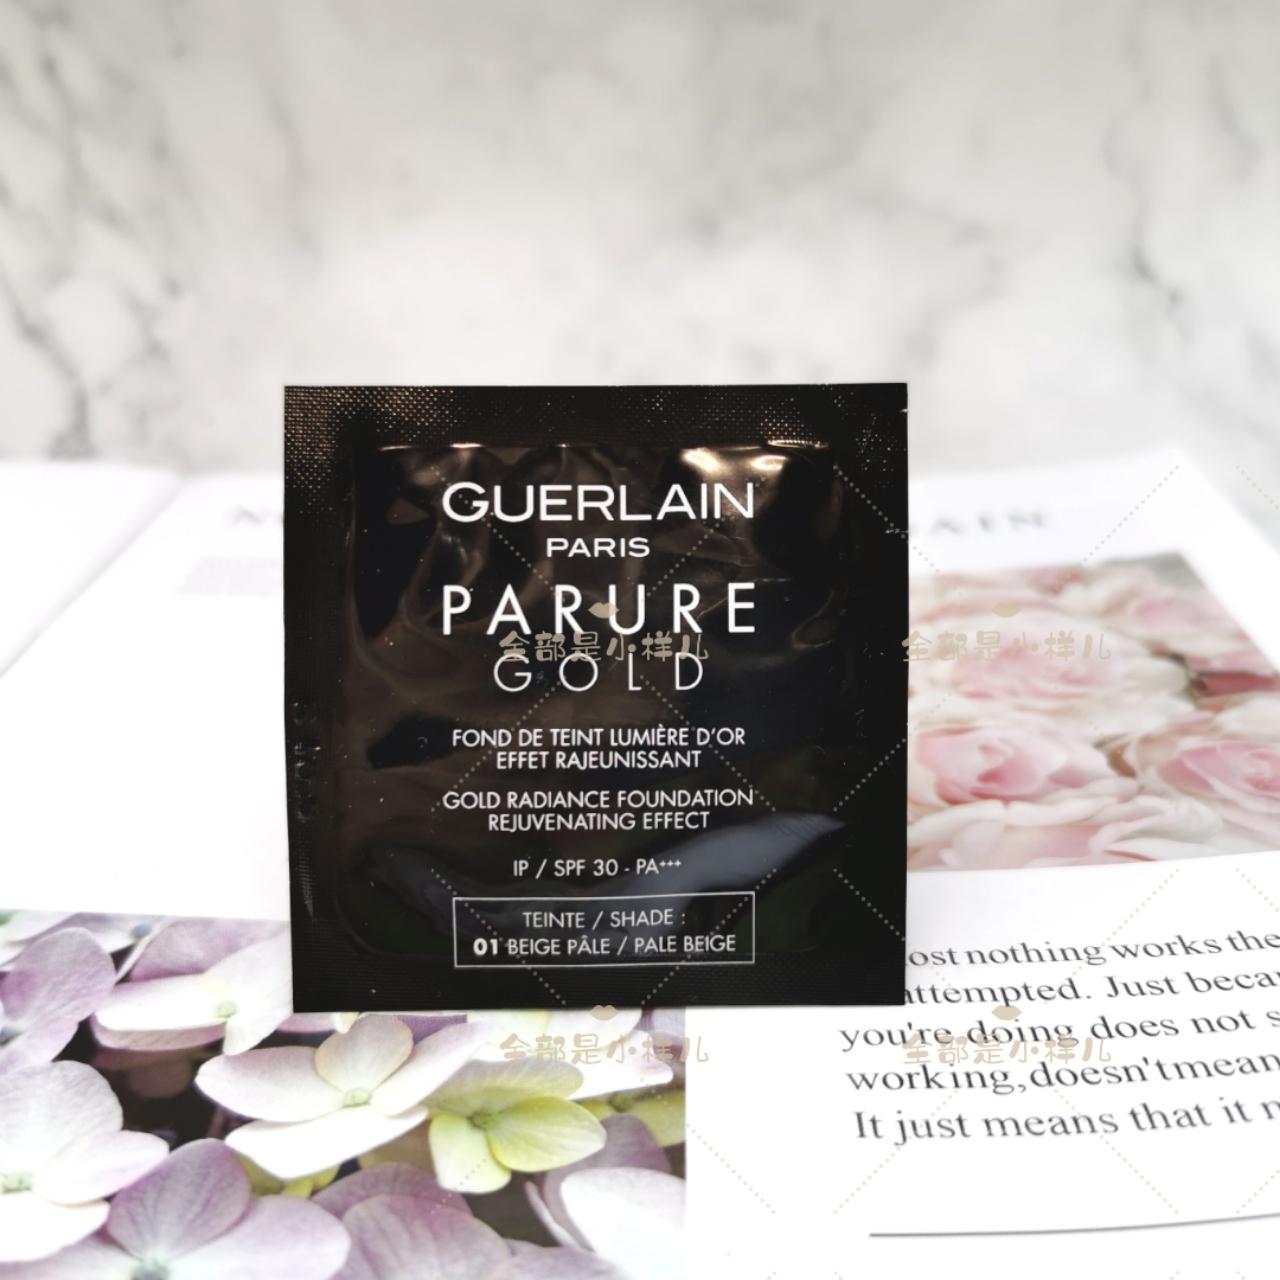 Guerlain diamond drill liquid foundation sample Korean duty-free shop purchasing Guerlain Guerlain new foundation repair experience